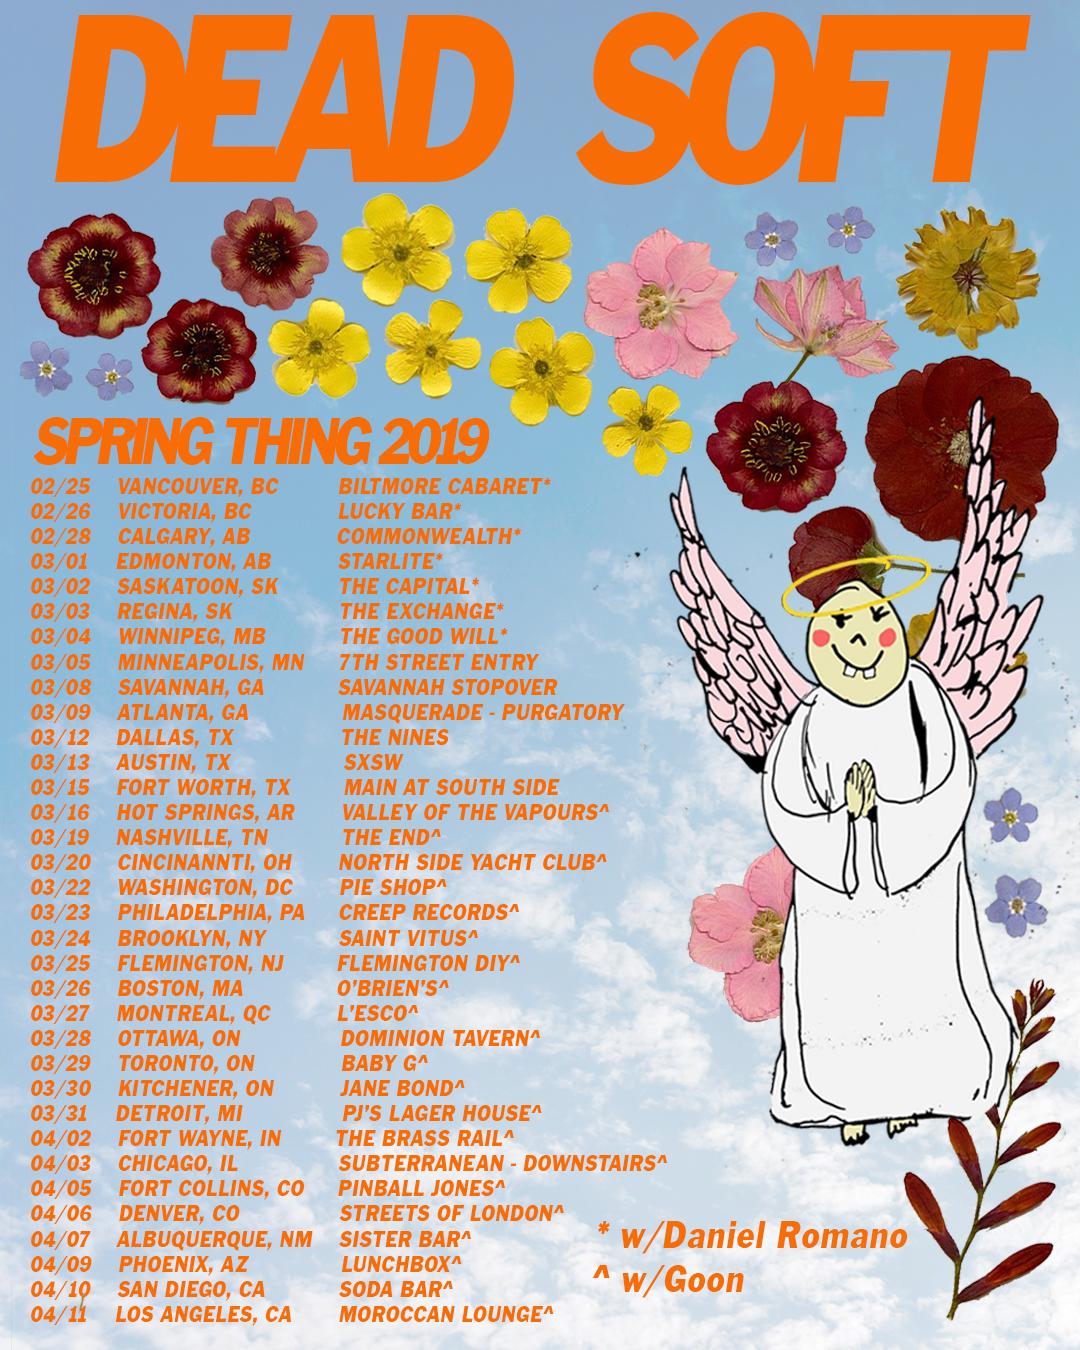 Dead Soft - Spring 2019 Tour Poster 01-27-19.jpg